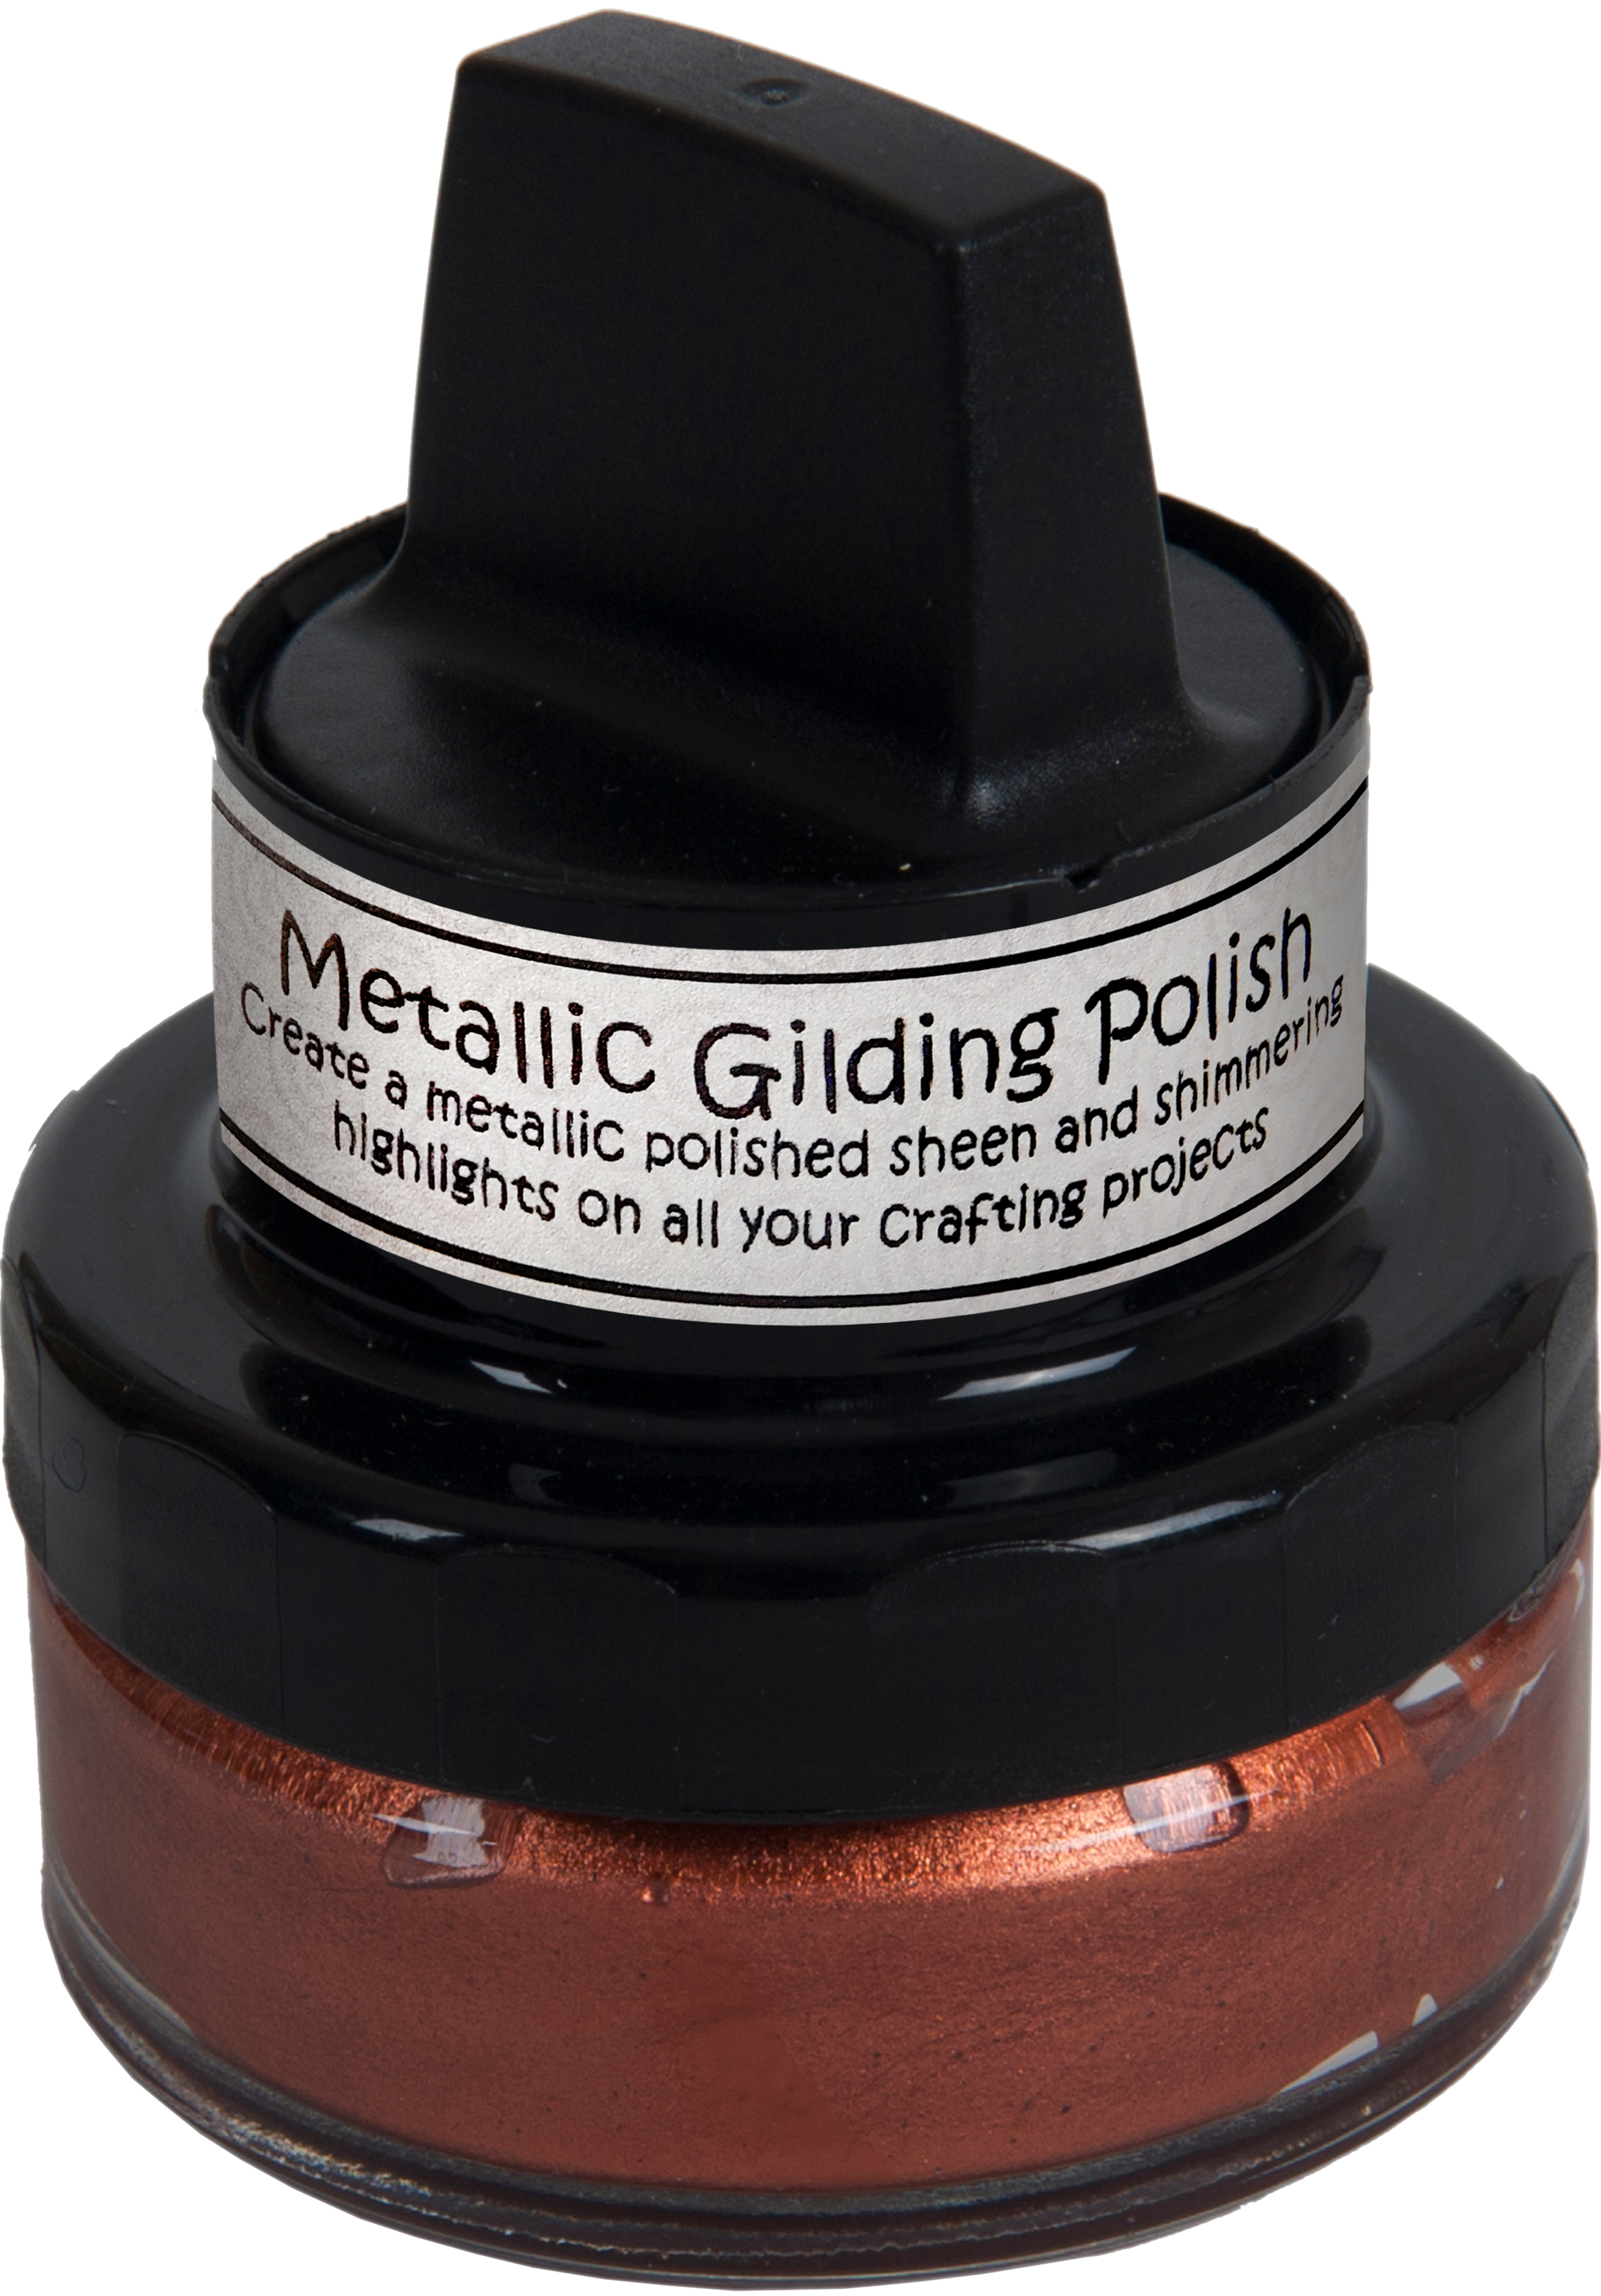 Cosmic Shimmer Metallic Gilding Polish Red Bronze